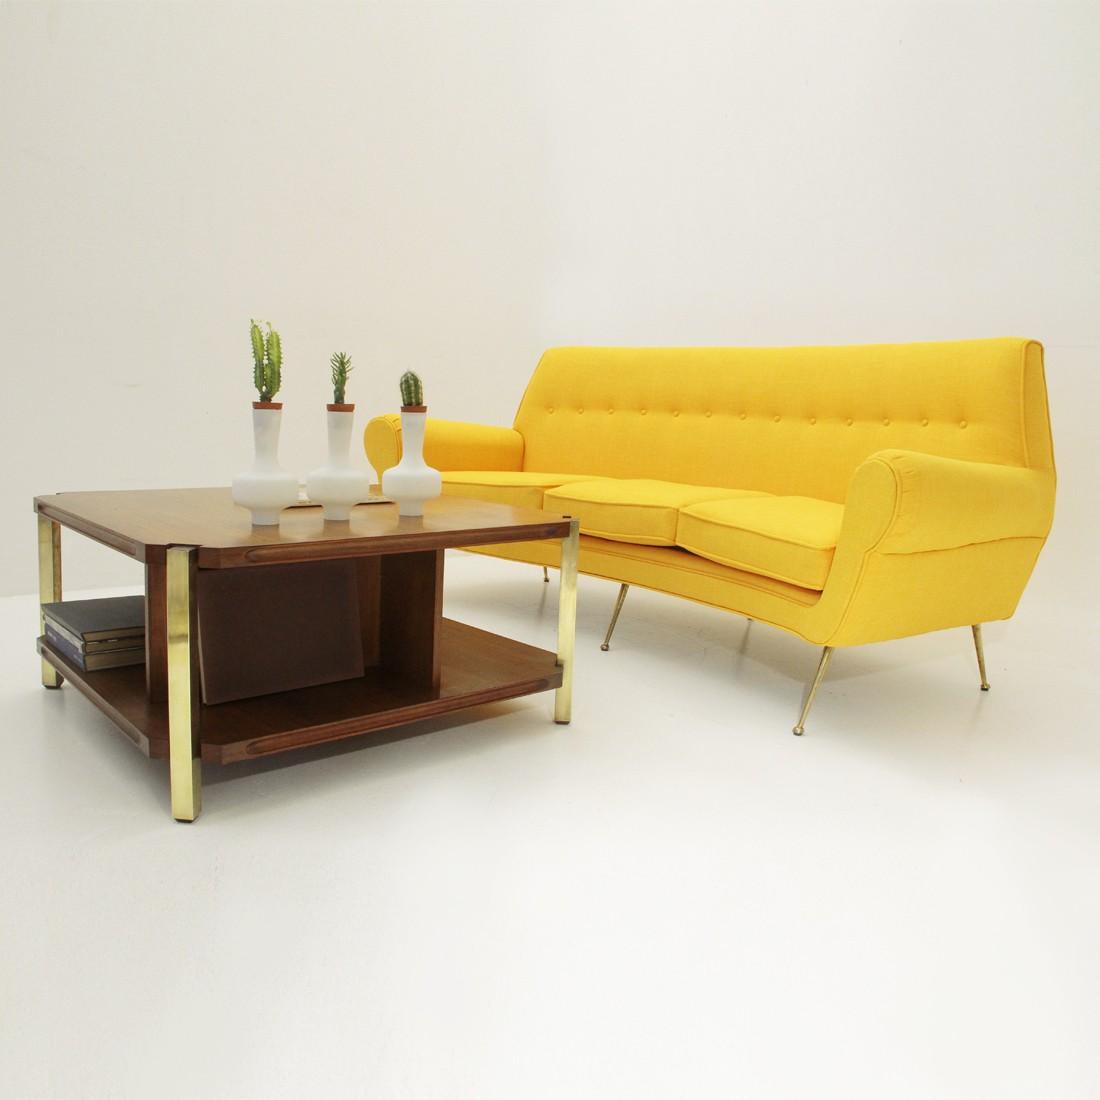 Italian Teak Coffee Table With Brass Legs